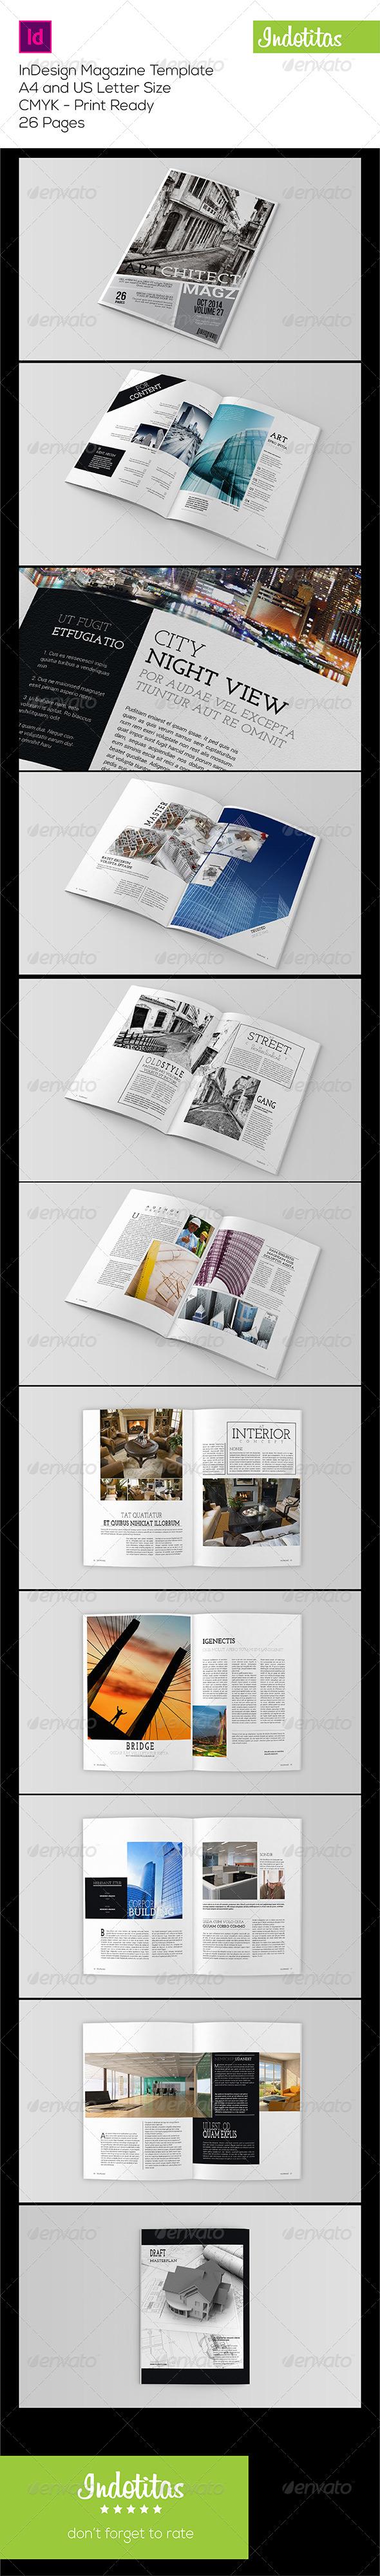 GraphicRiver Indesign Magazine Template 7897723